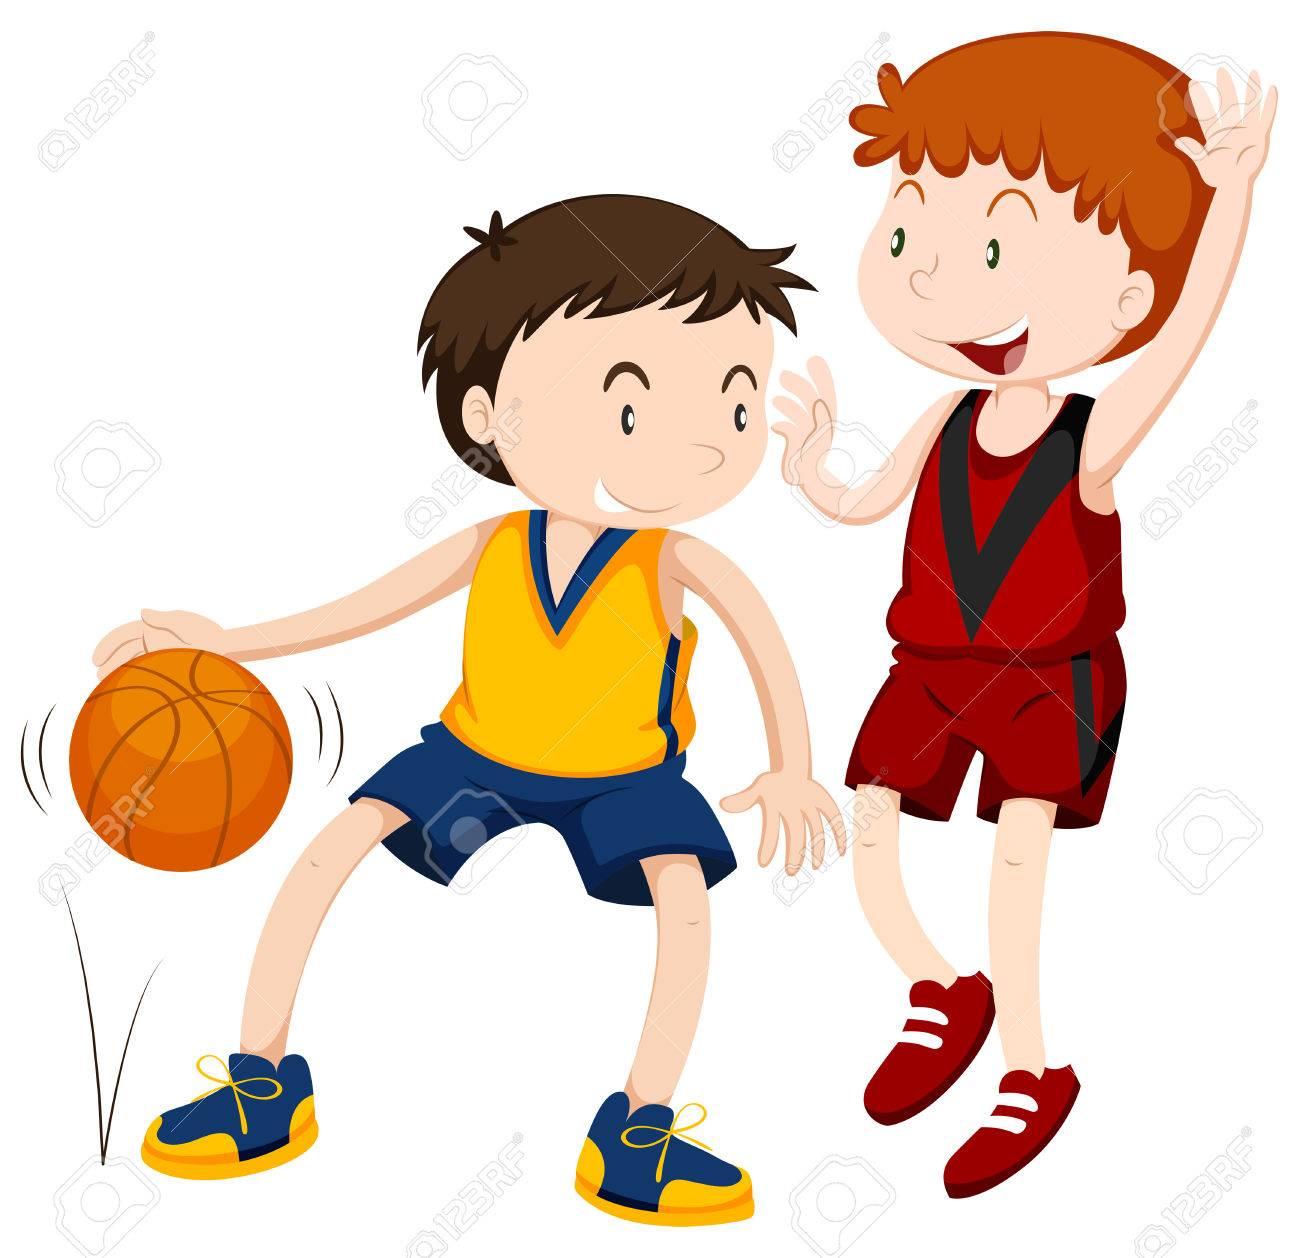 Two boys playing basketball illustration.